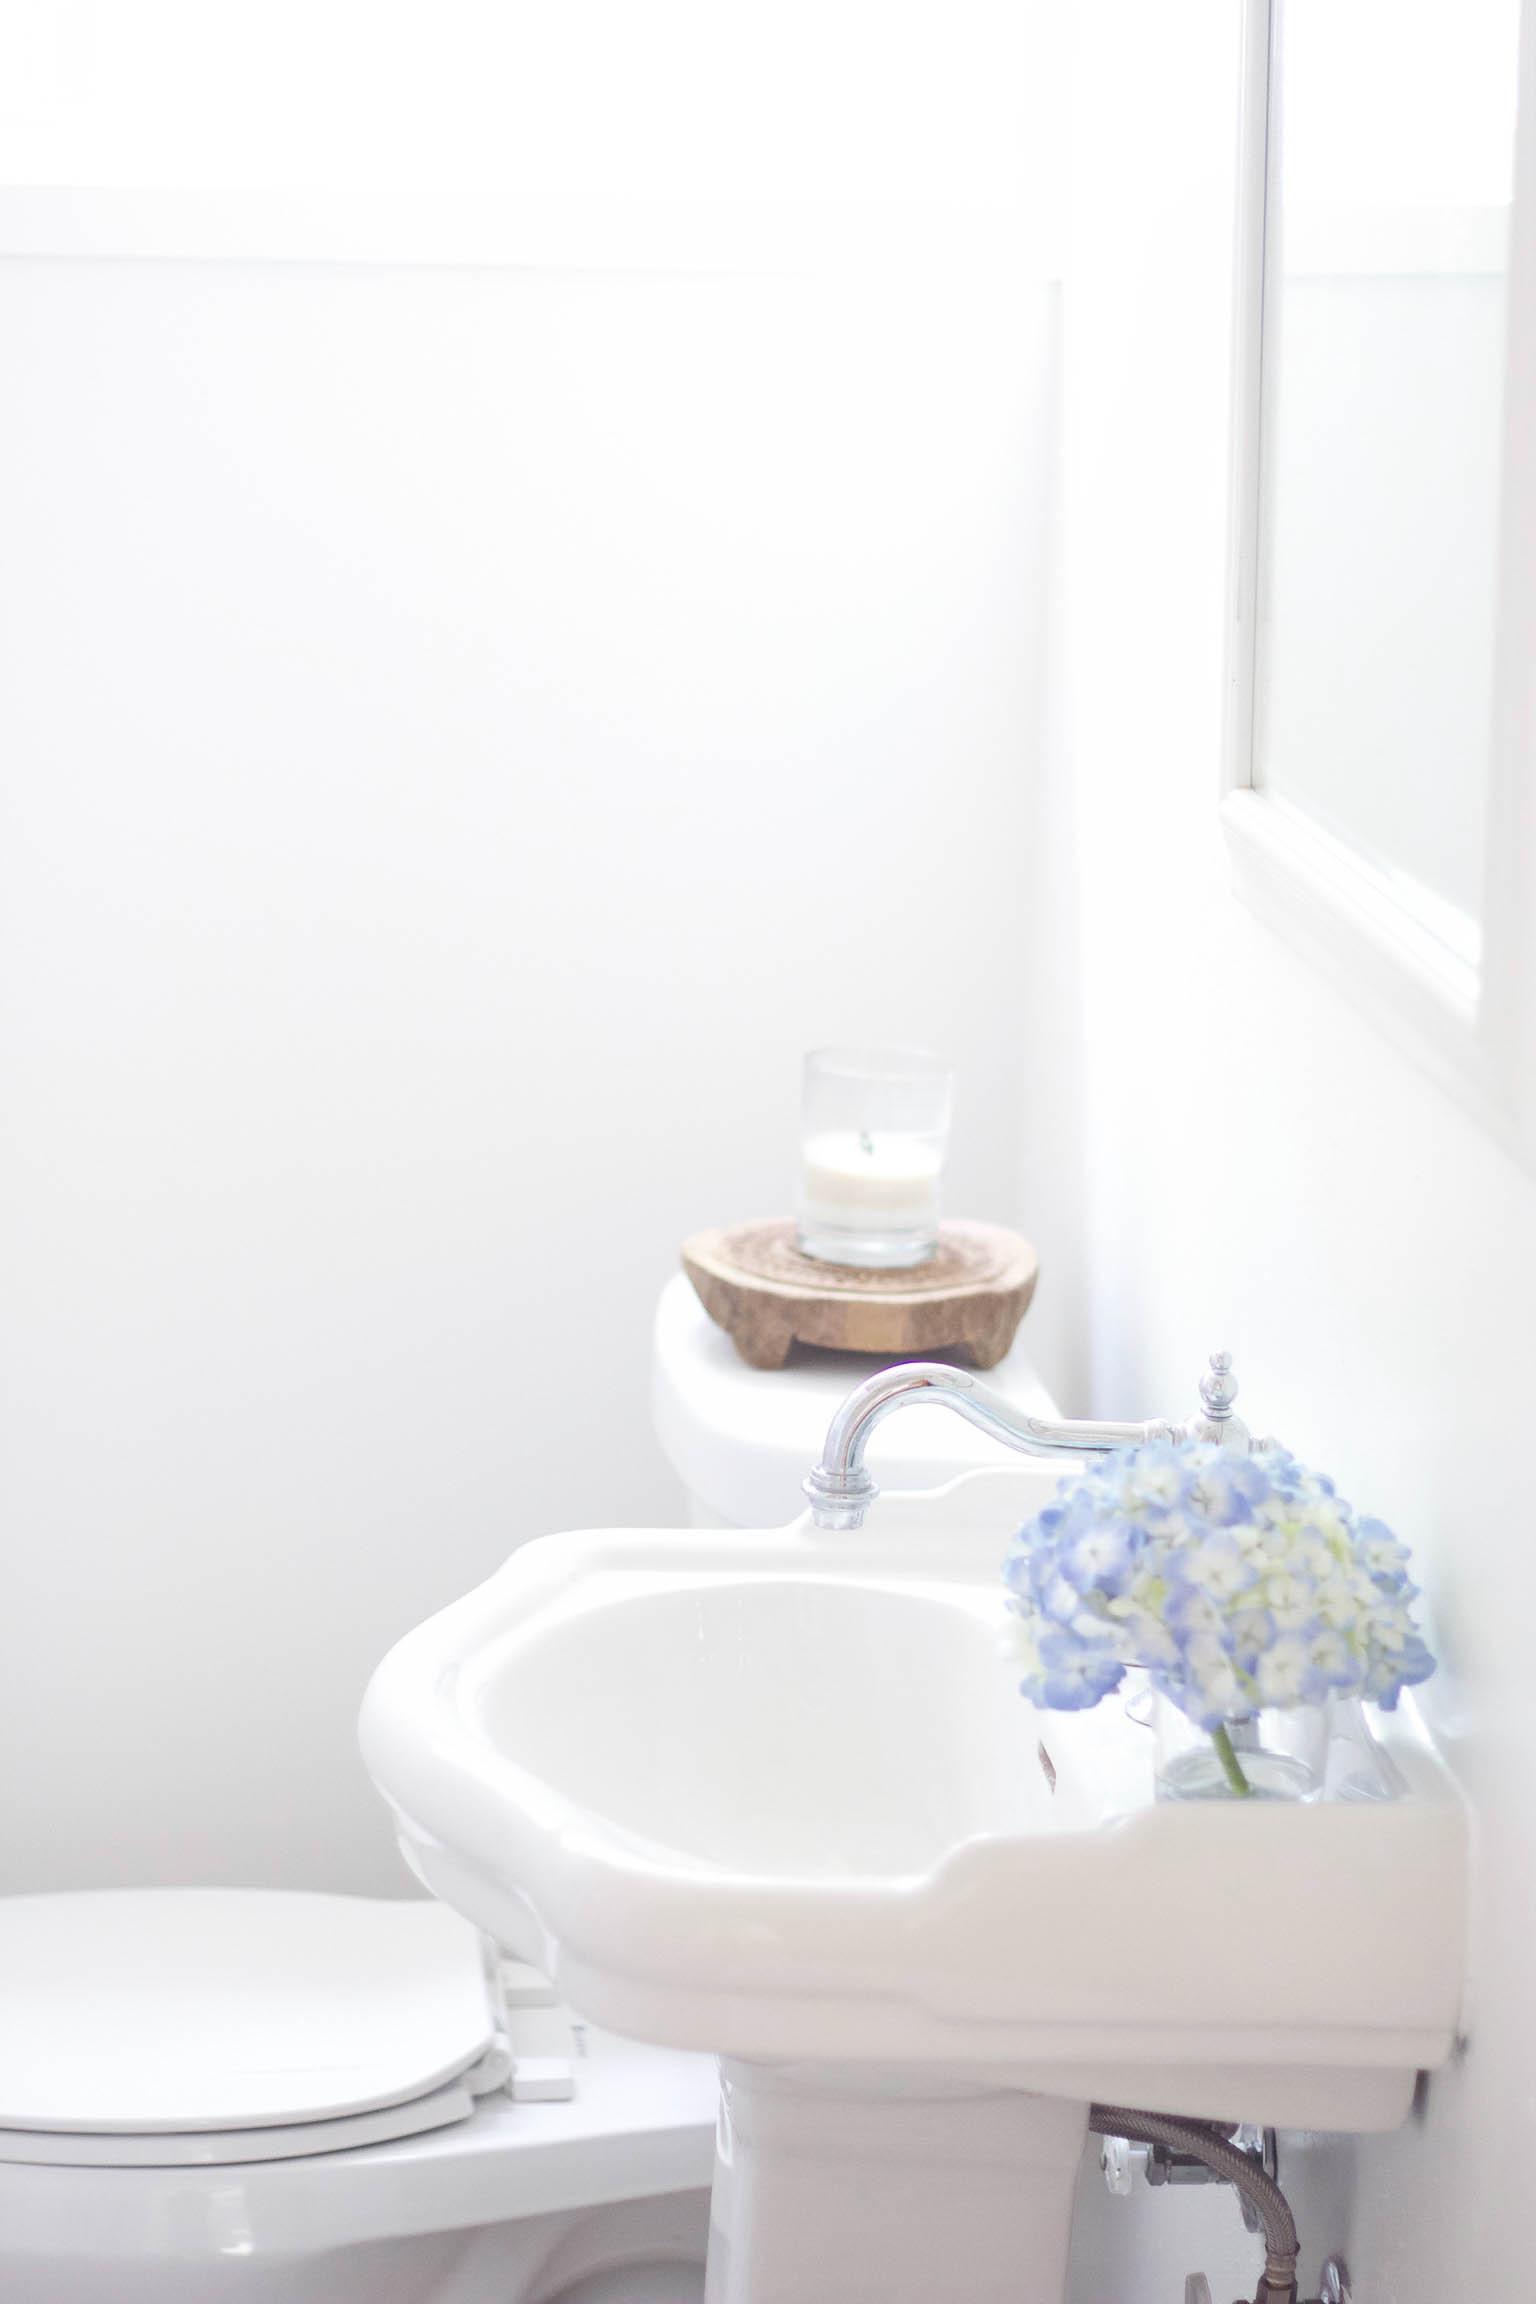 Bathroom Makeover Ideas With Bold Bathroom Tile Designs